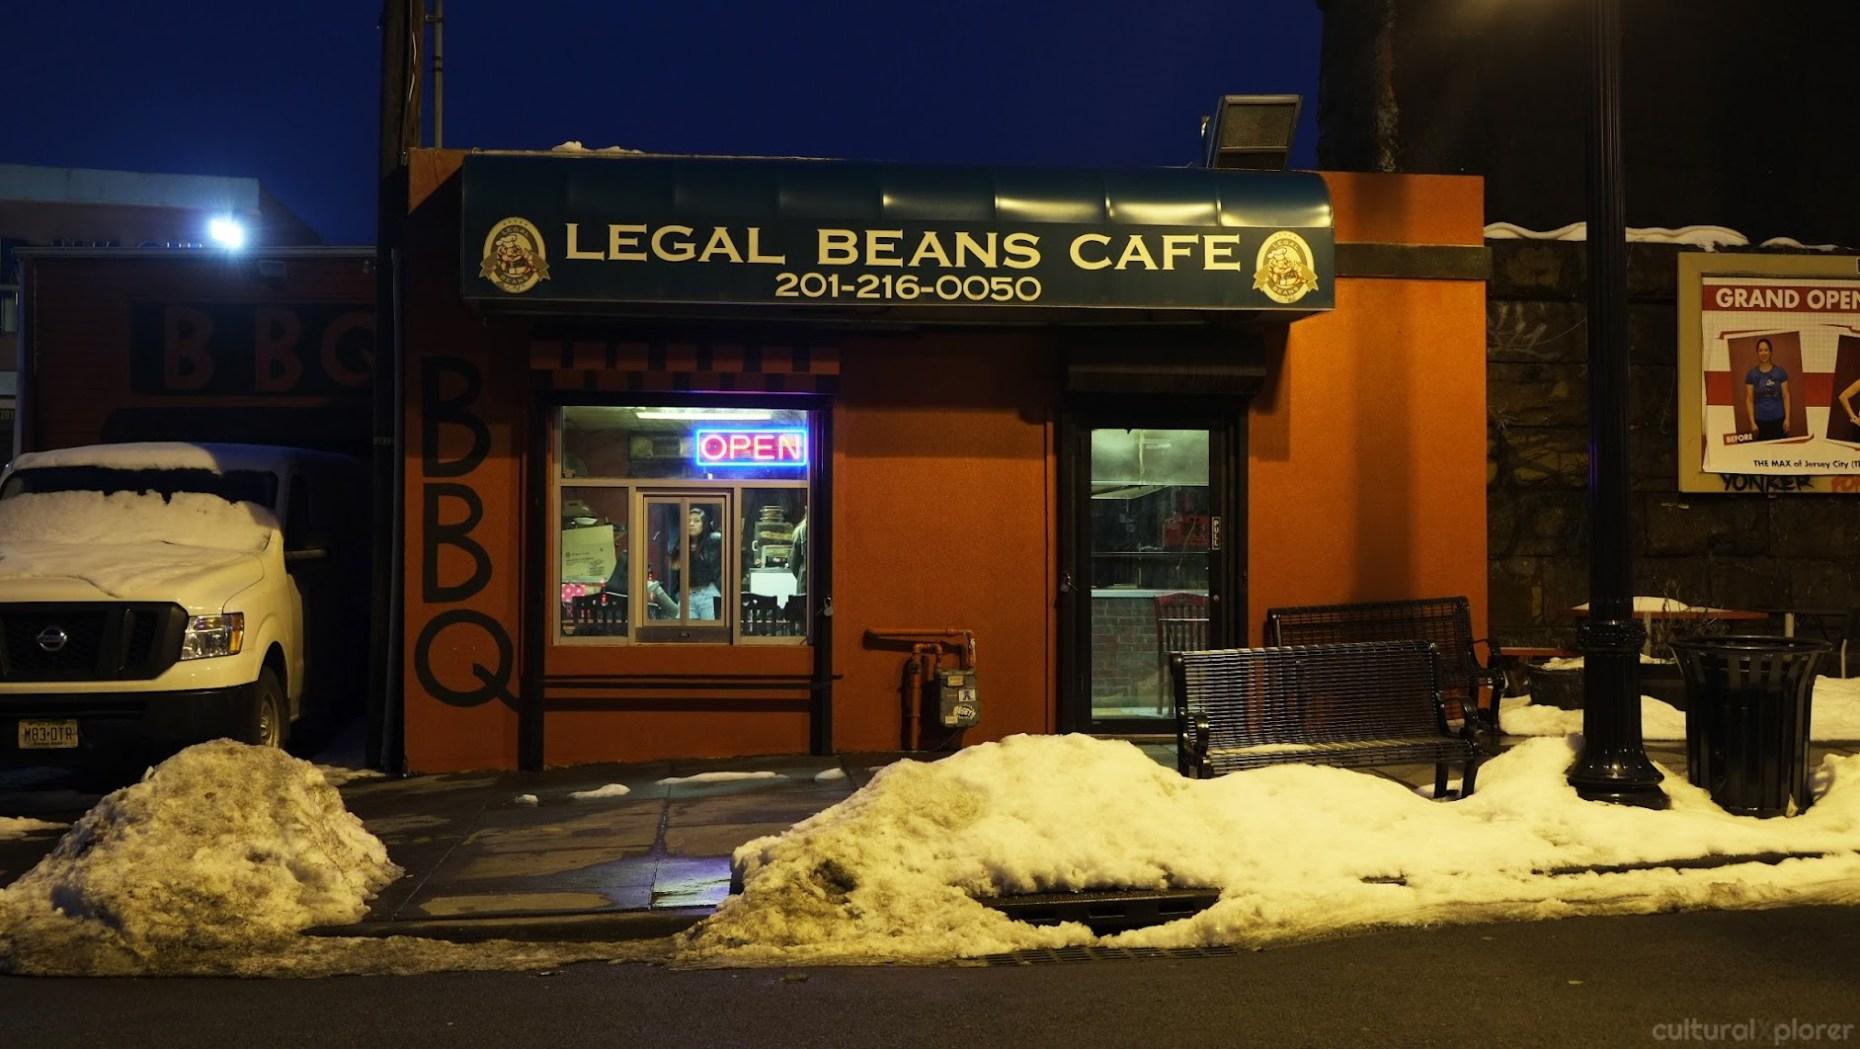 Legal Beans Cafe